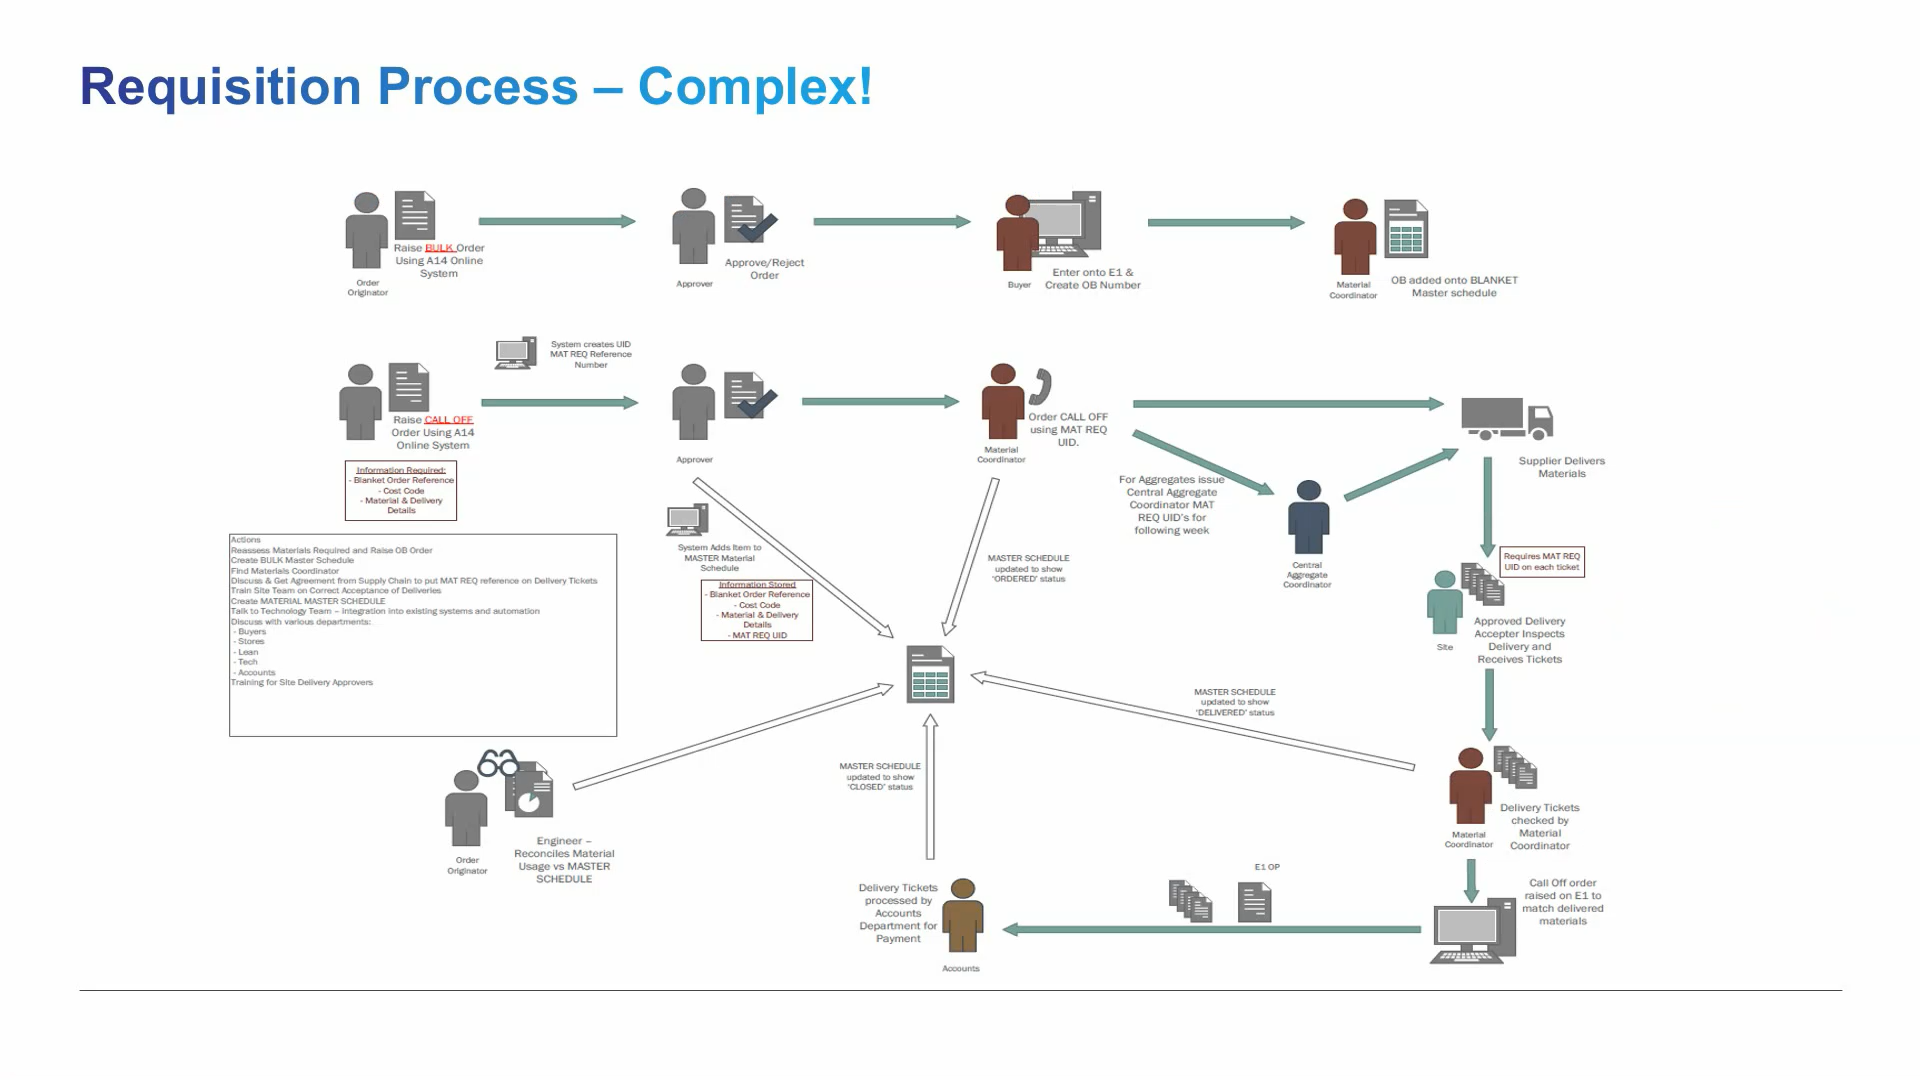 Materials Requisition Screenshot - Complex